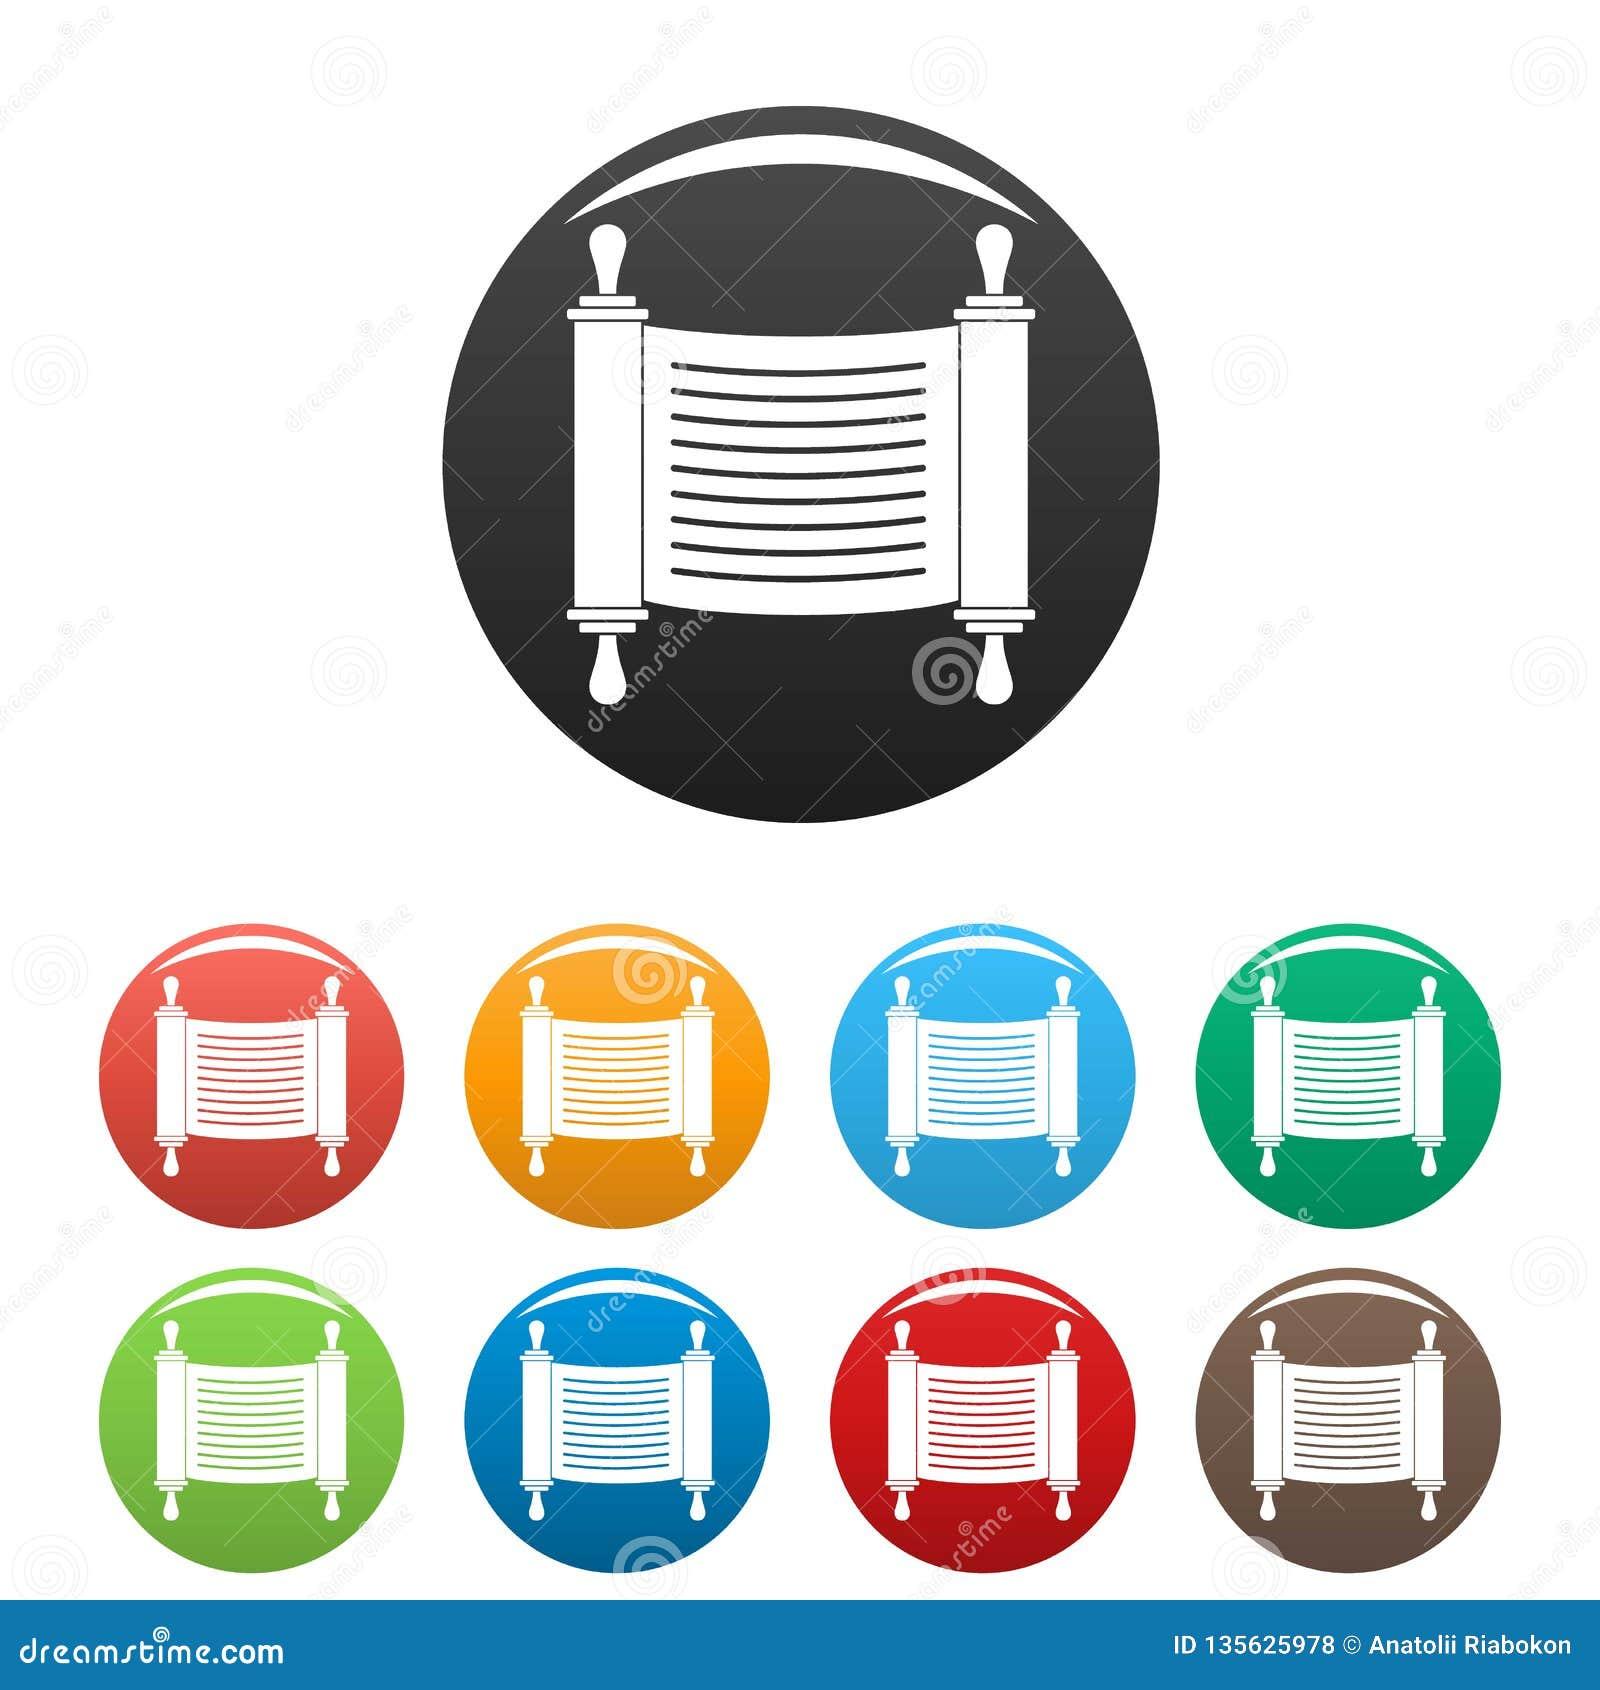 Torah scroll icons set color